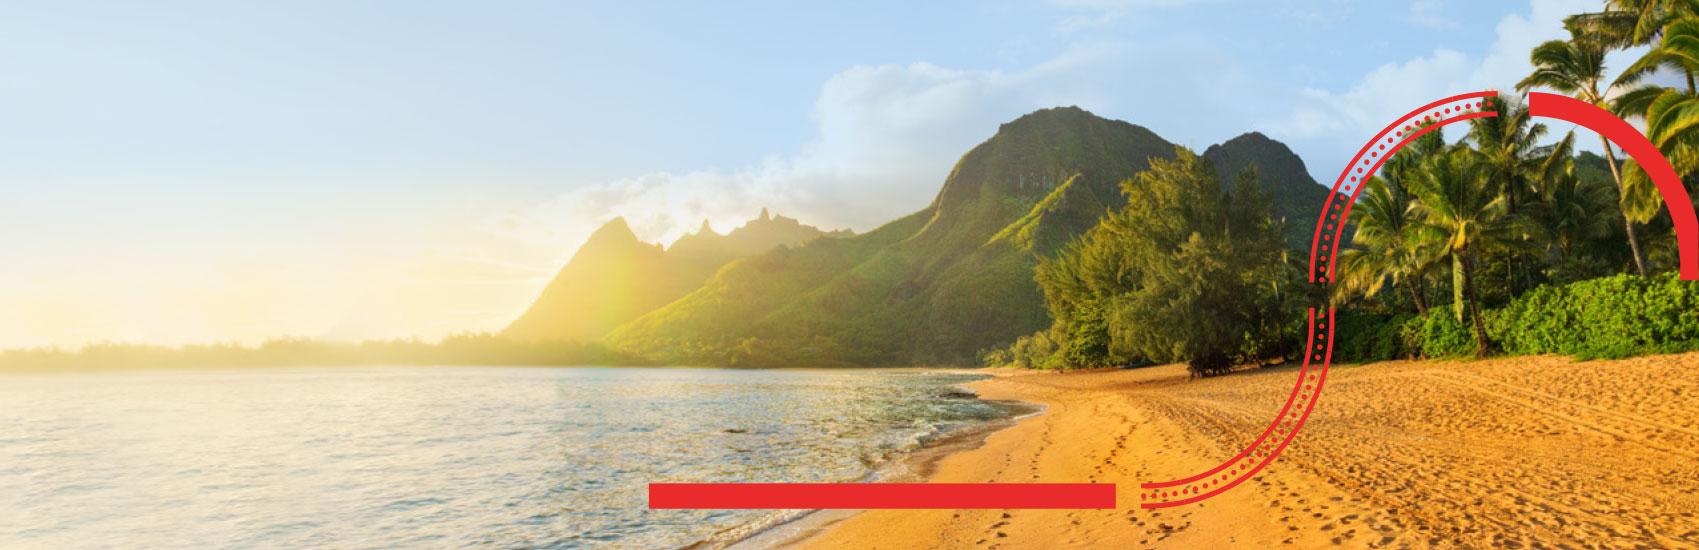 Save the Taxes on Hawaii